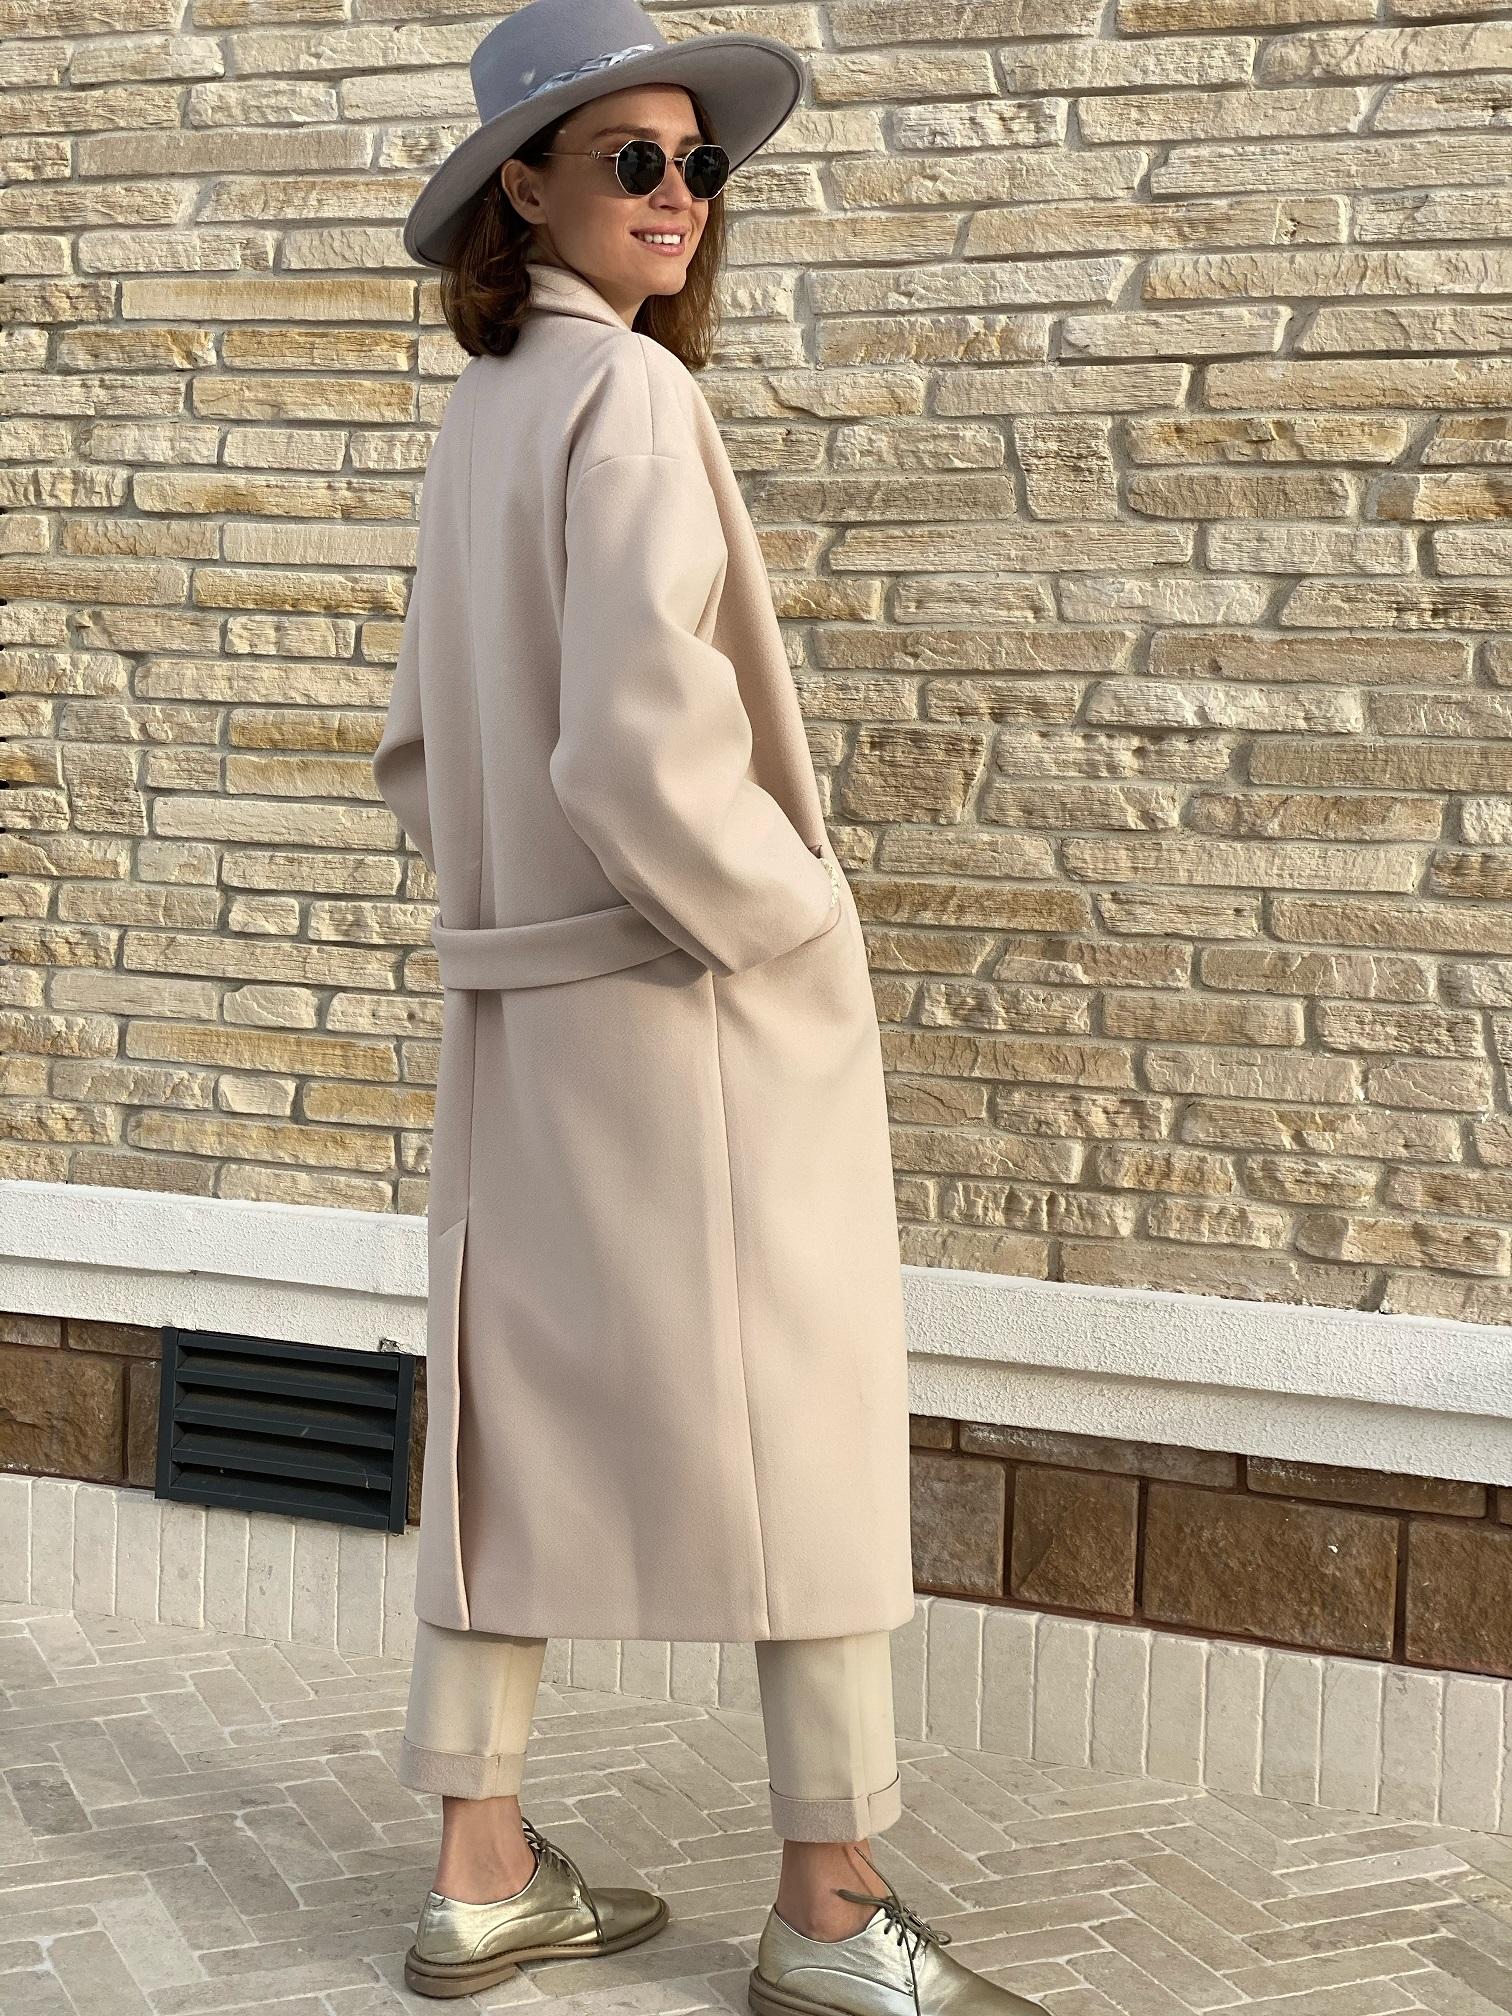 Пальто, Ballerina, Fifth Avenue (молочный)